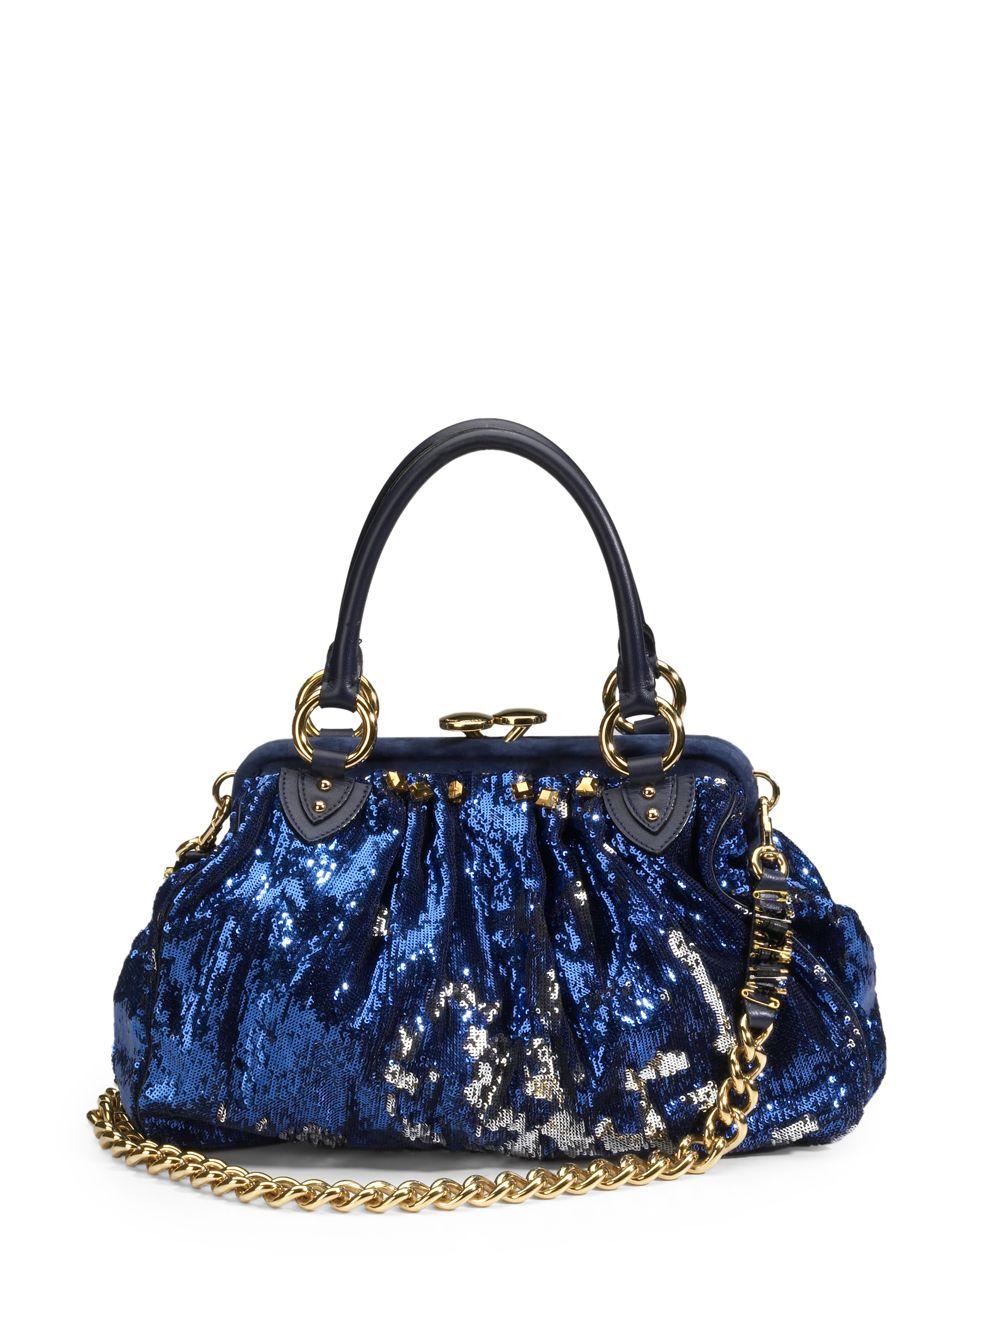 Marc Jacobs New York Rocker Sequin Stam Bag 6oqevhj918